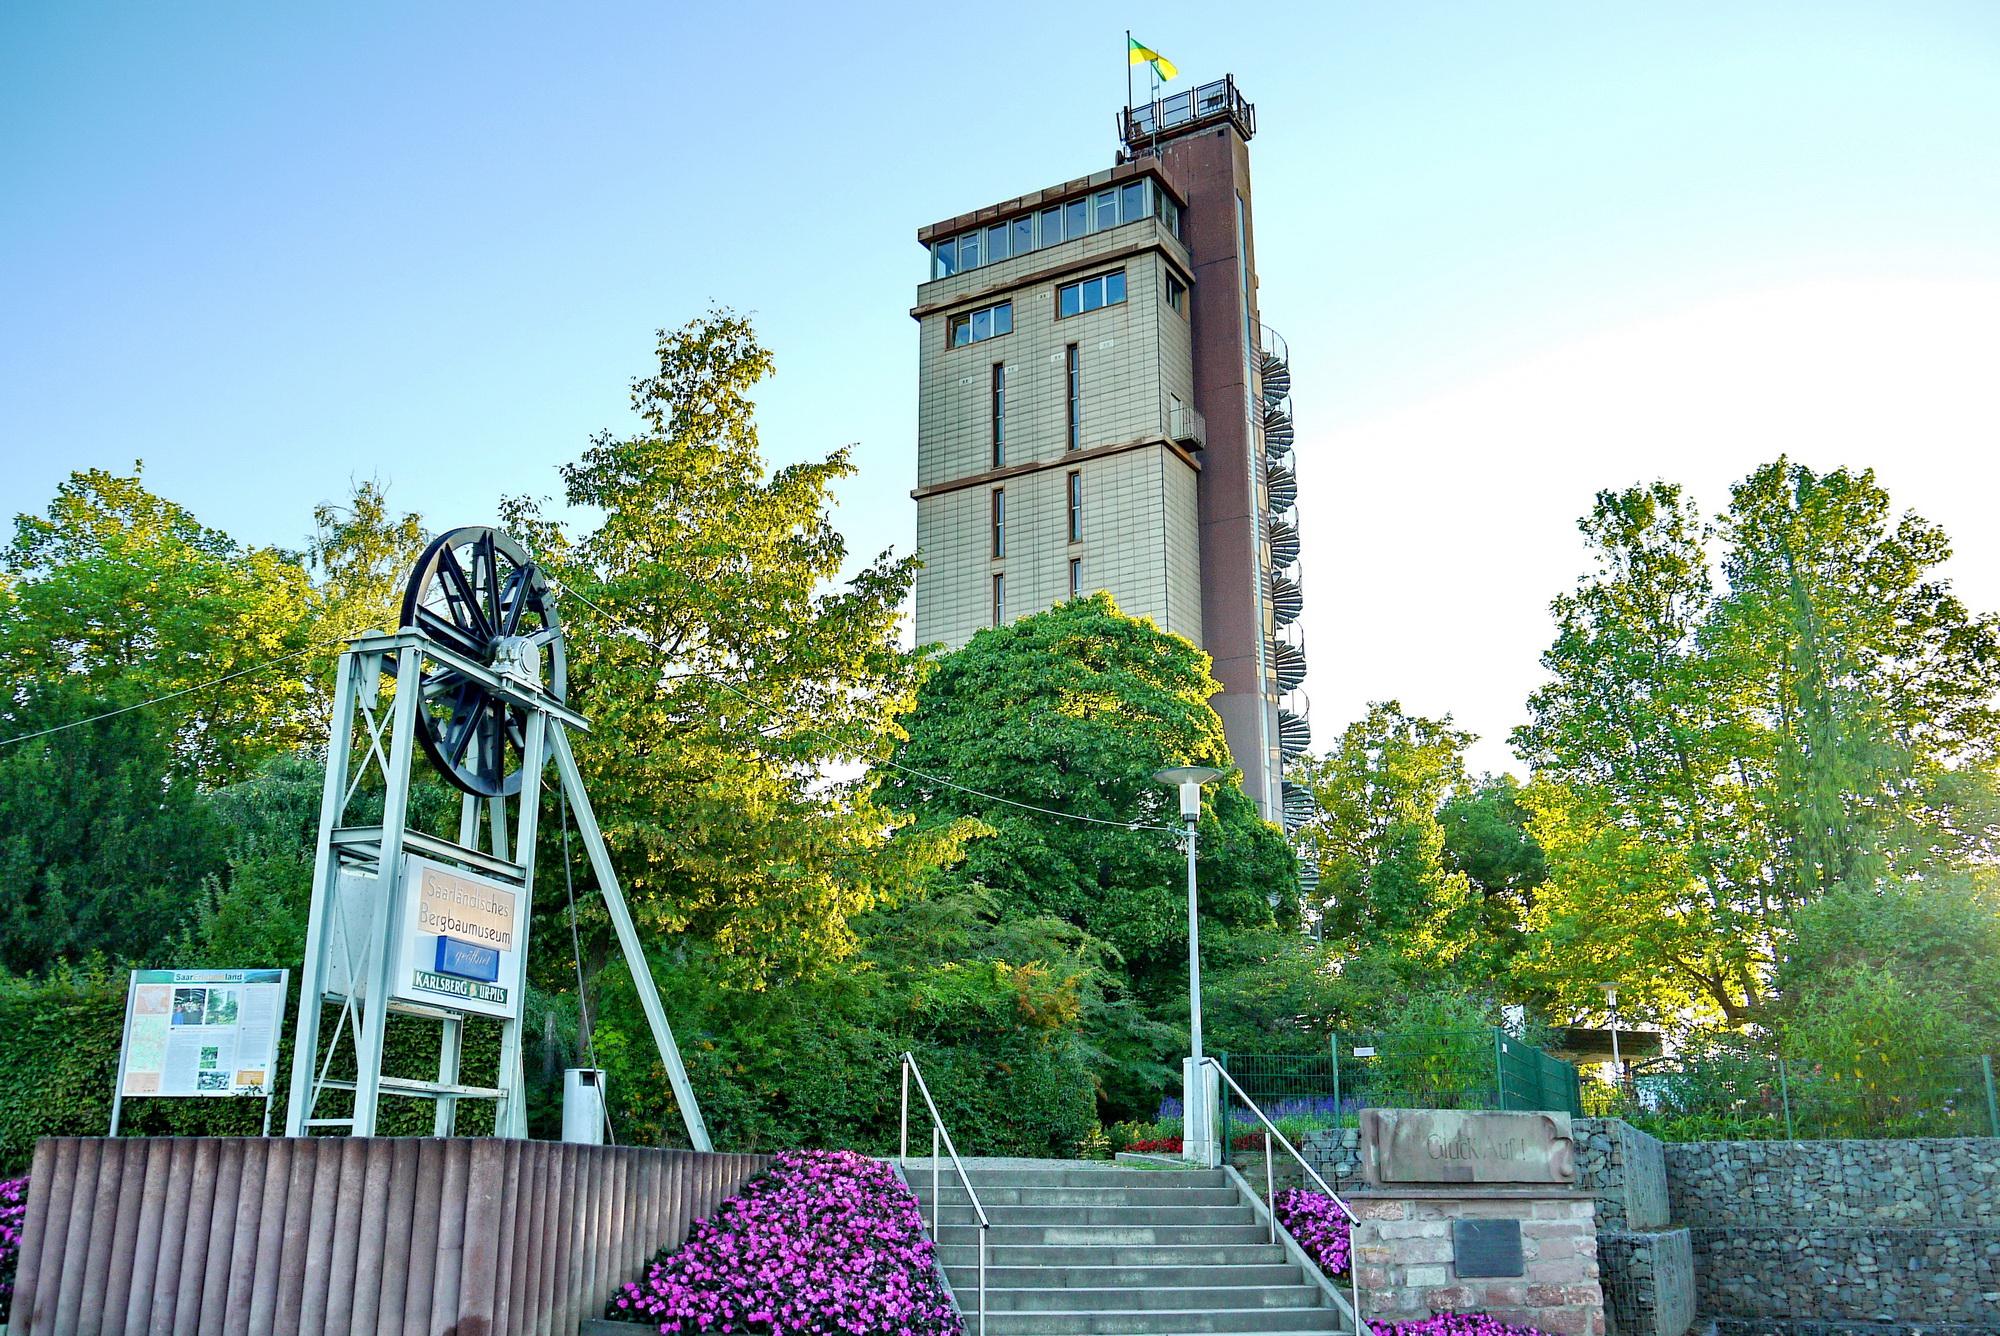 Hindenburgturm Bergbaumuseum Bexbach